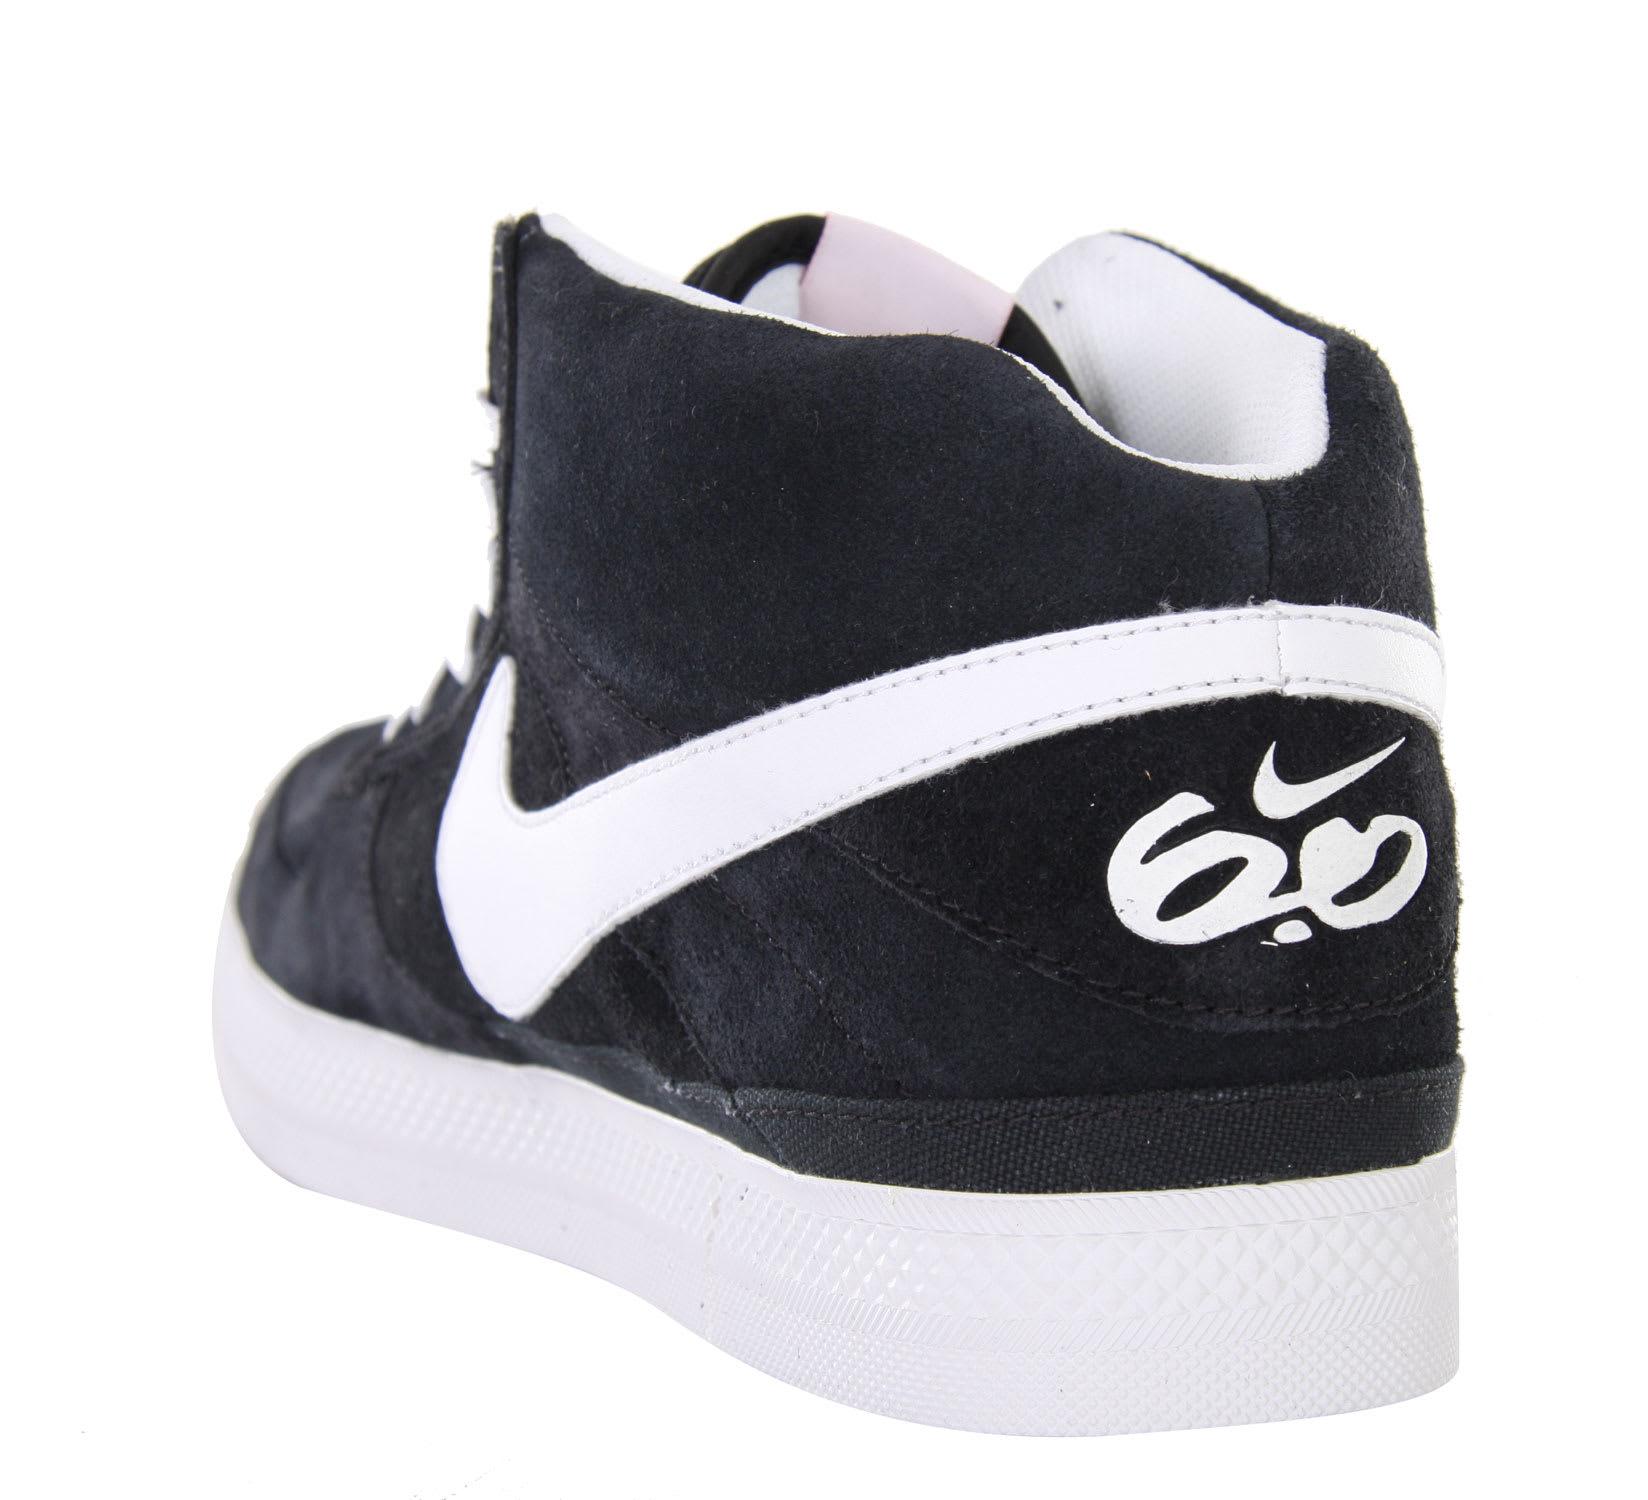 Nike Mavrk Mid 2 Skate Shoes